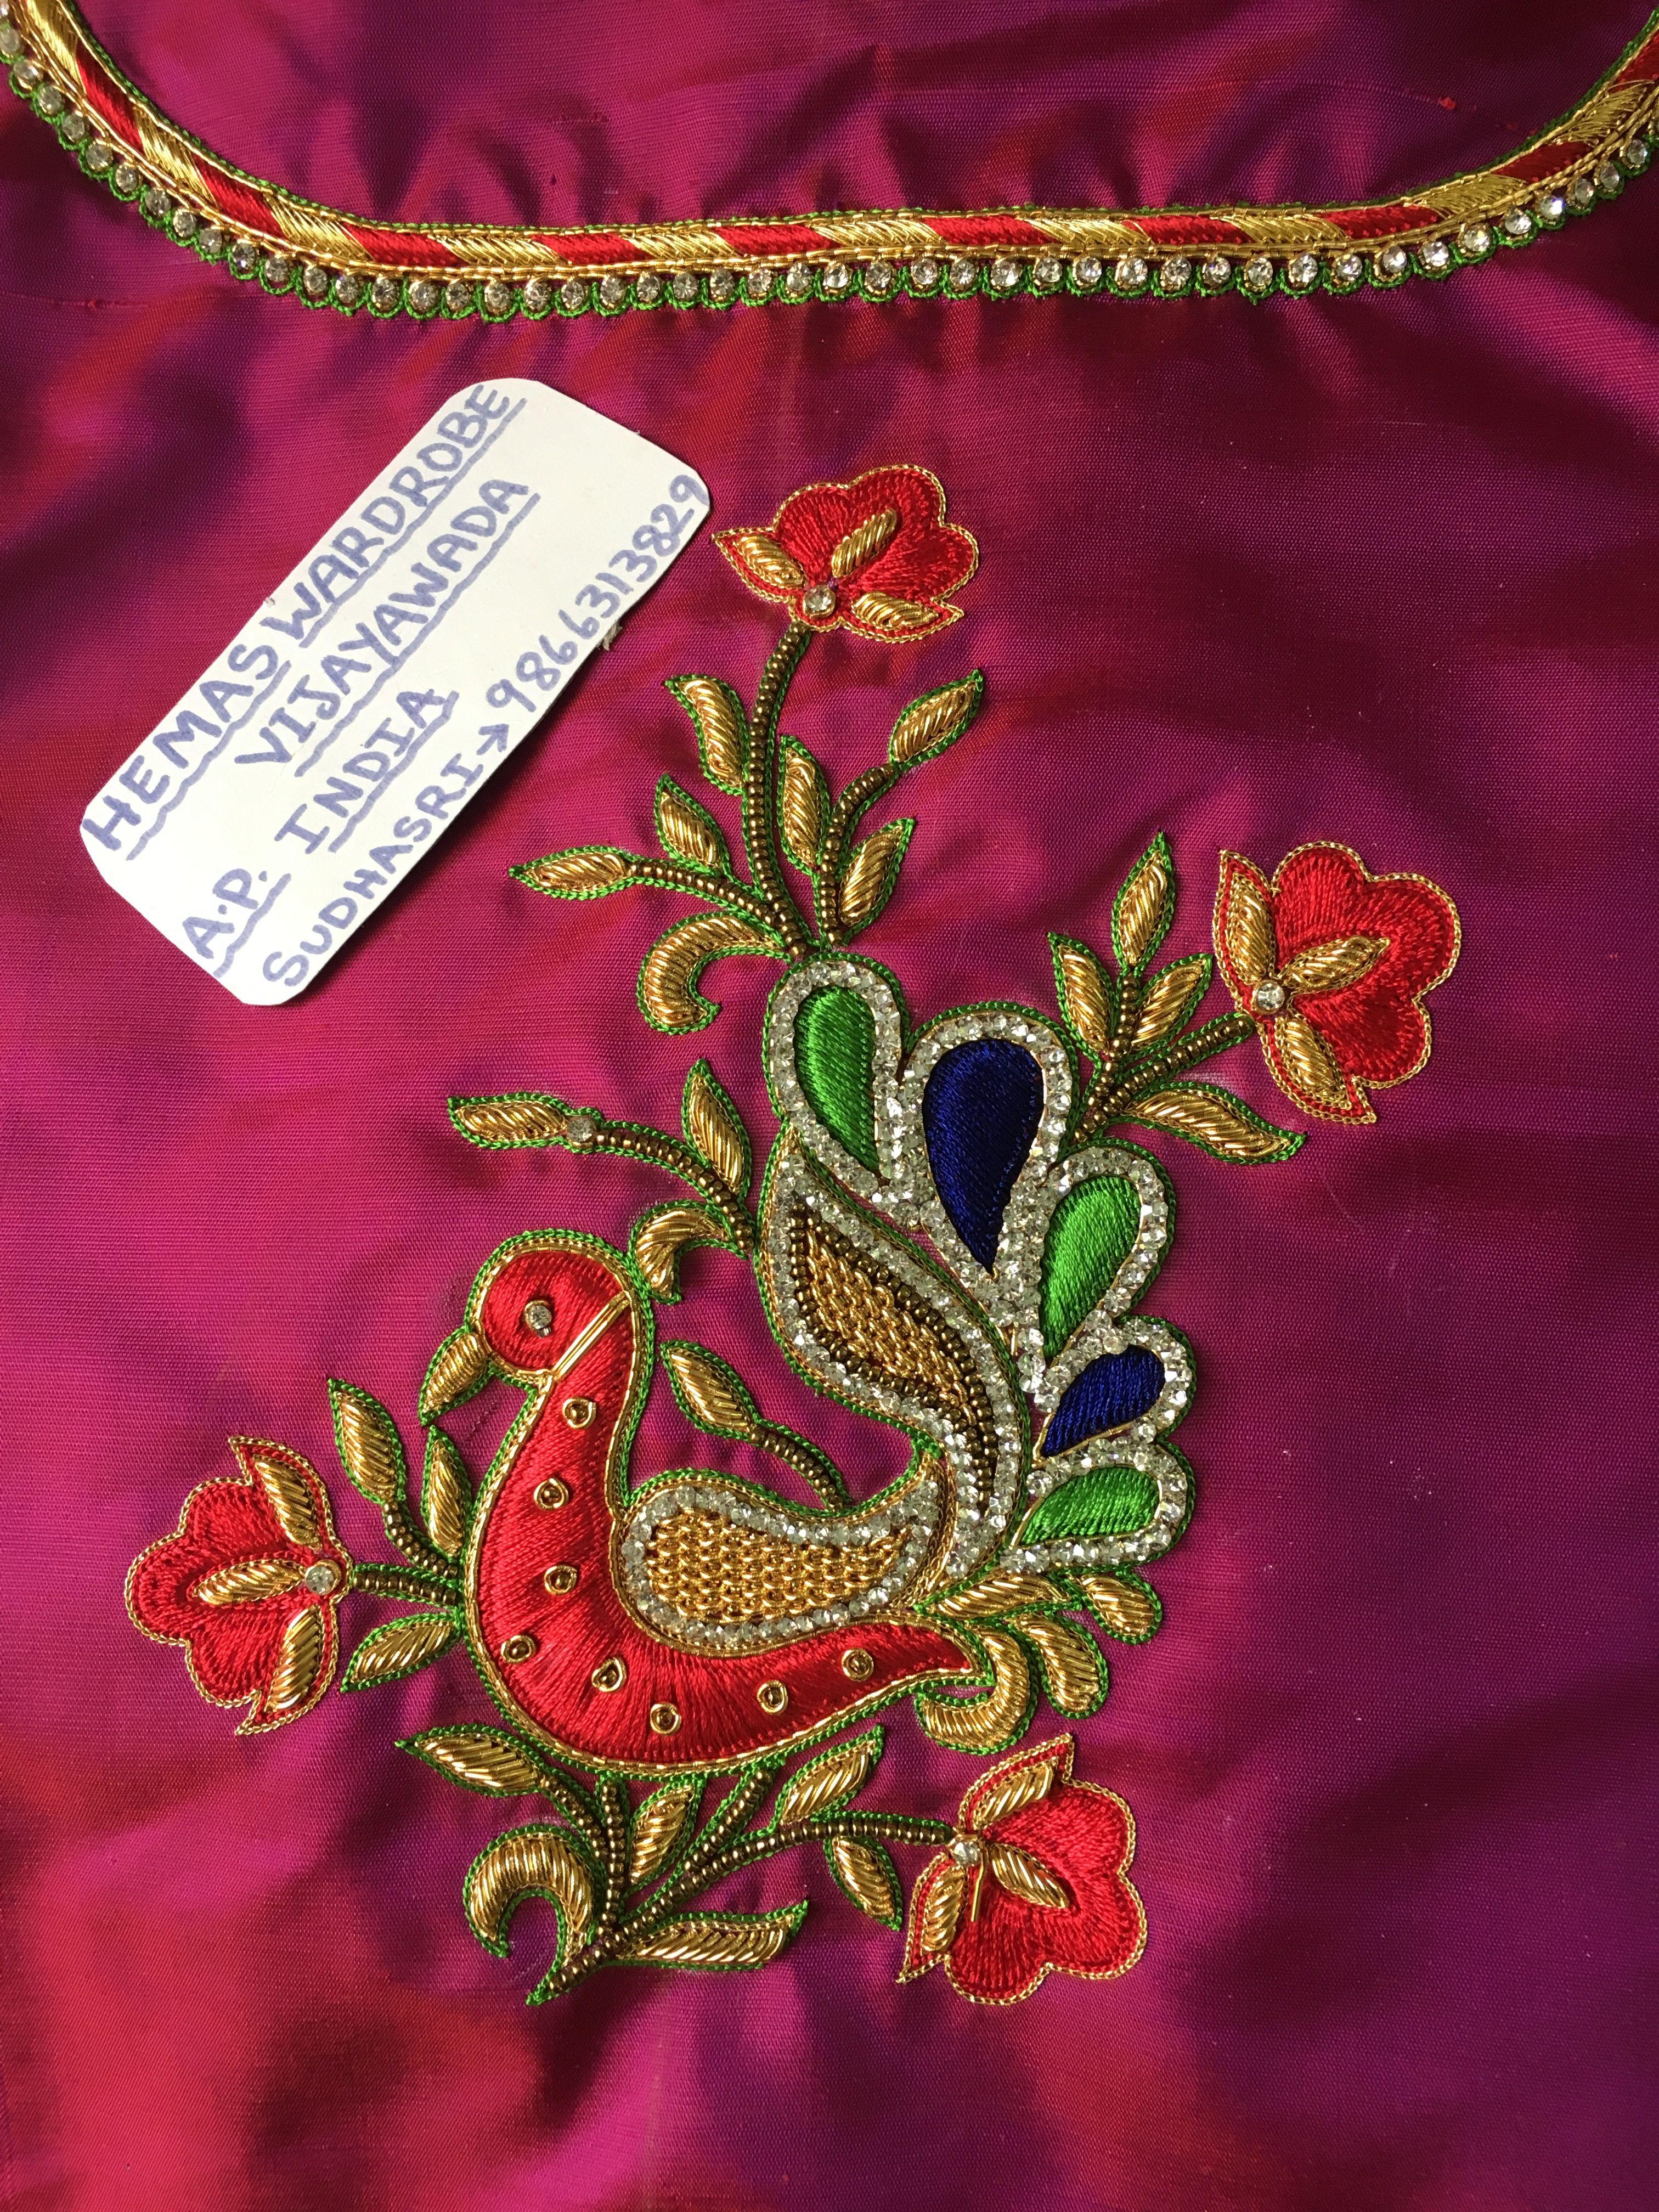 Sudhasri hemaswardrobe blouse patterns pinterest blouse